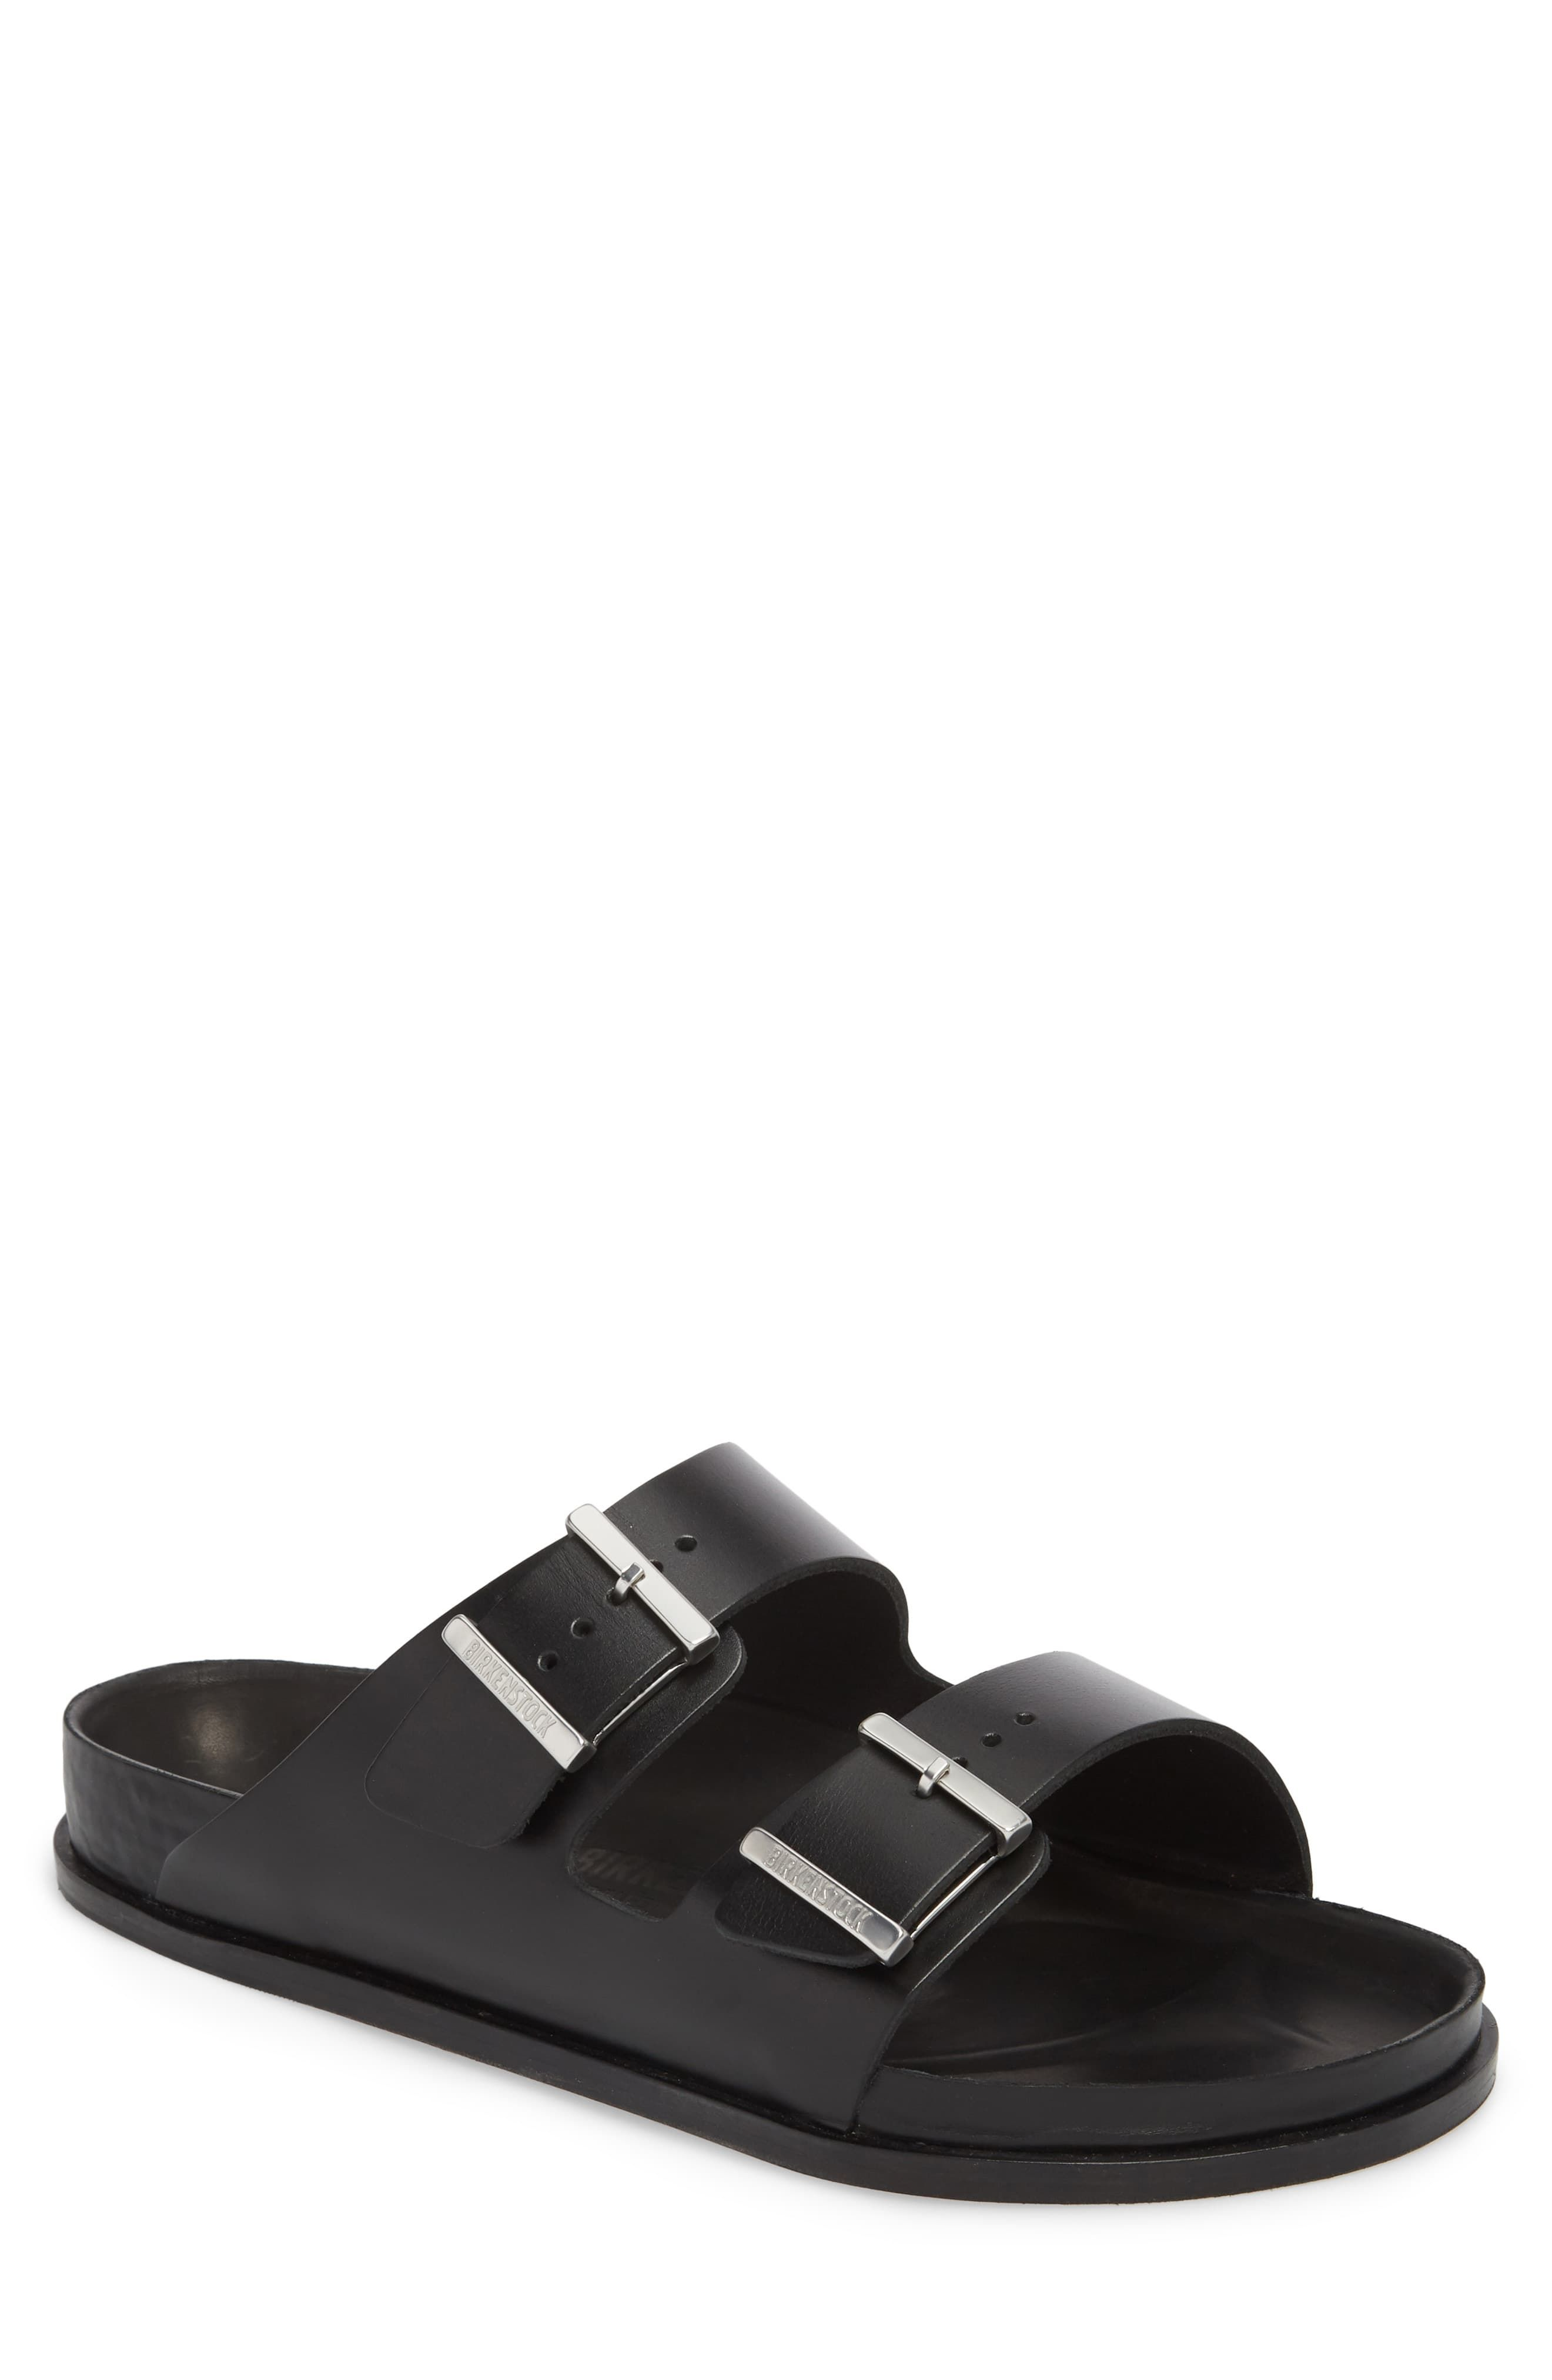 Birkenstock Arizona Premium Slide Sandal (Men) | Nordstrom